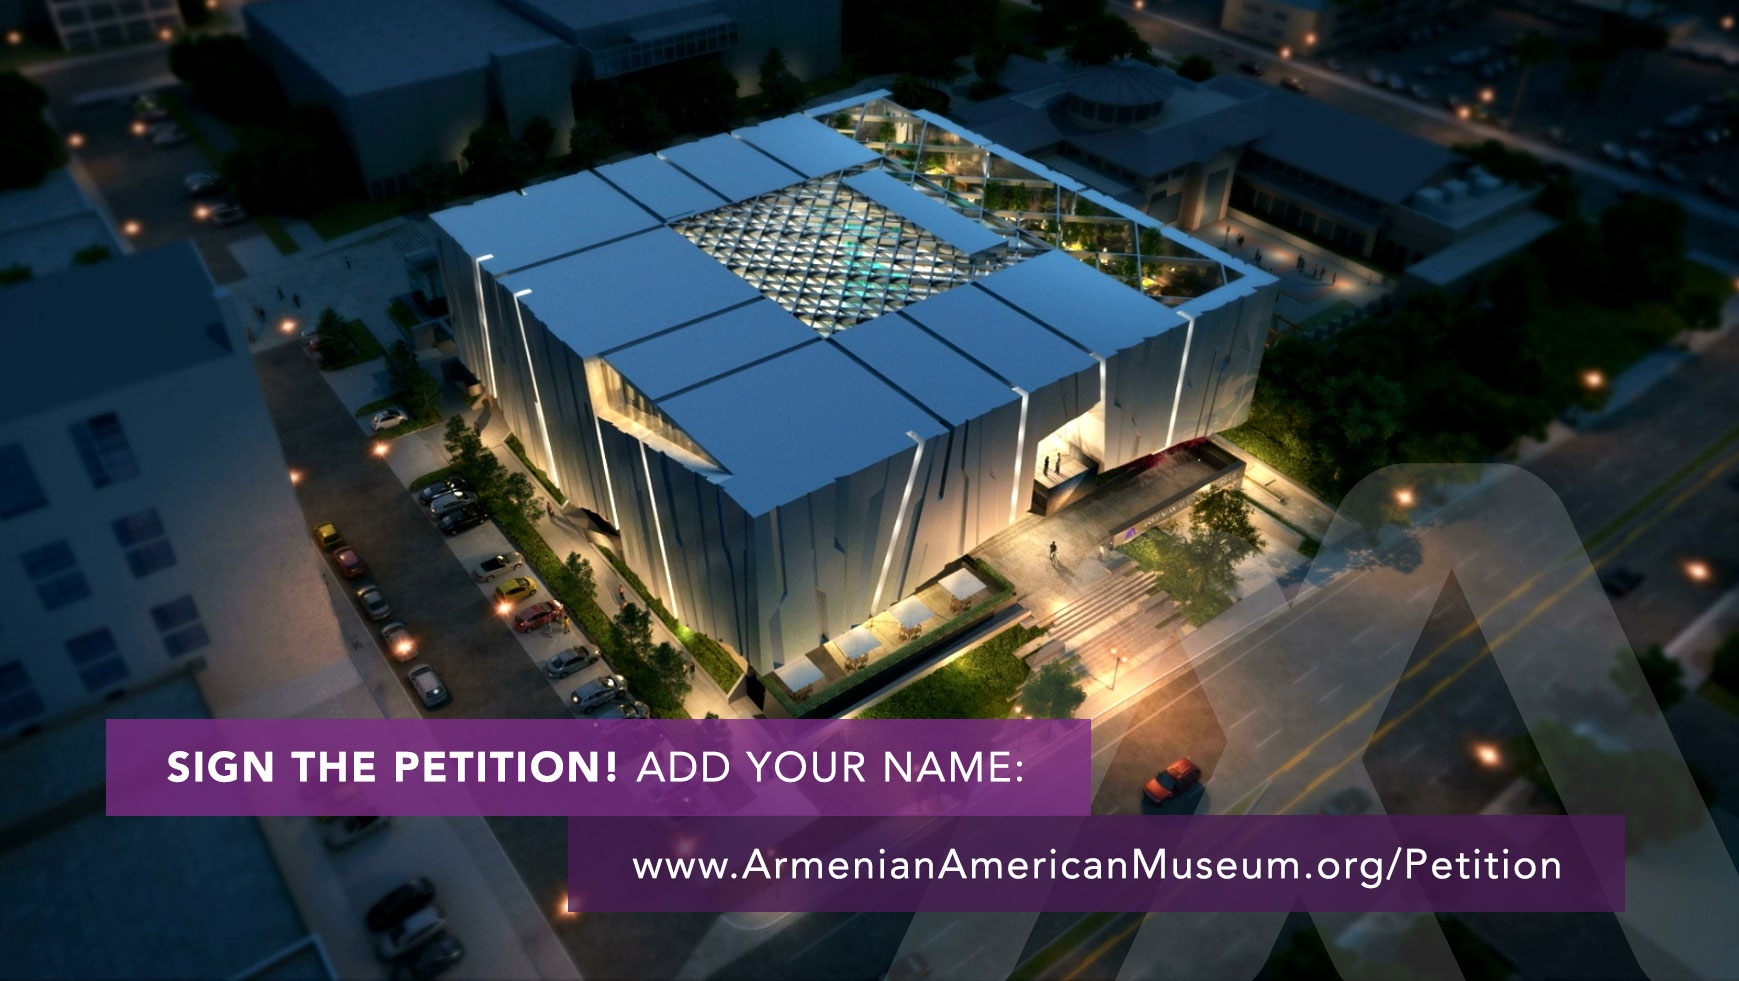 Armenian American Museum Petition